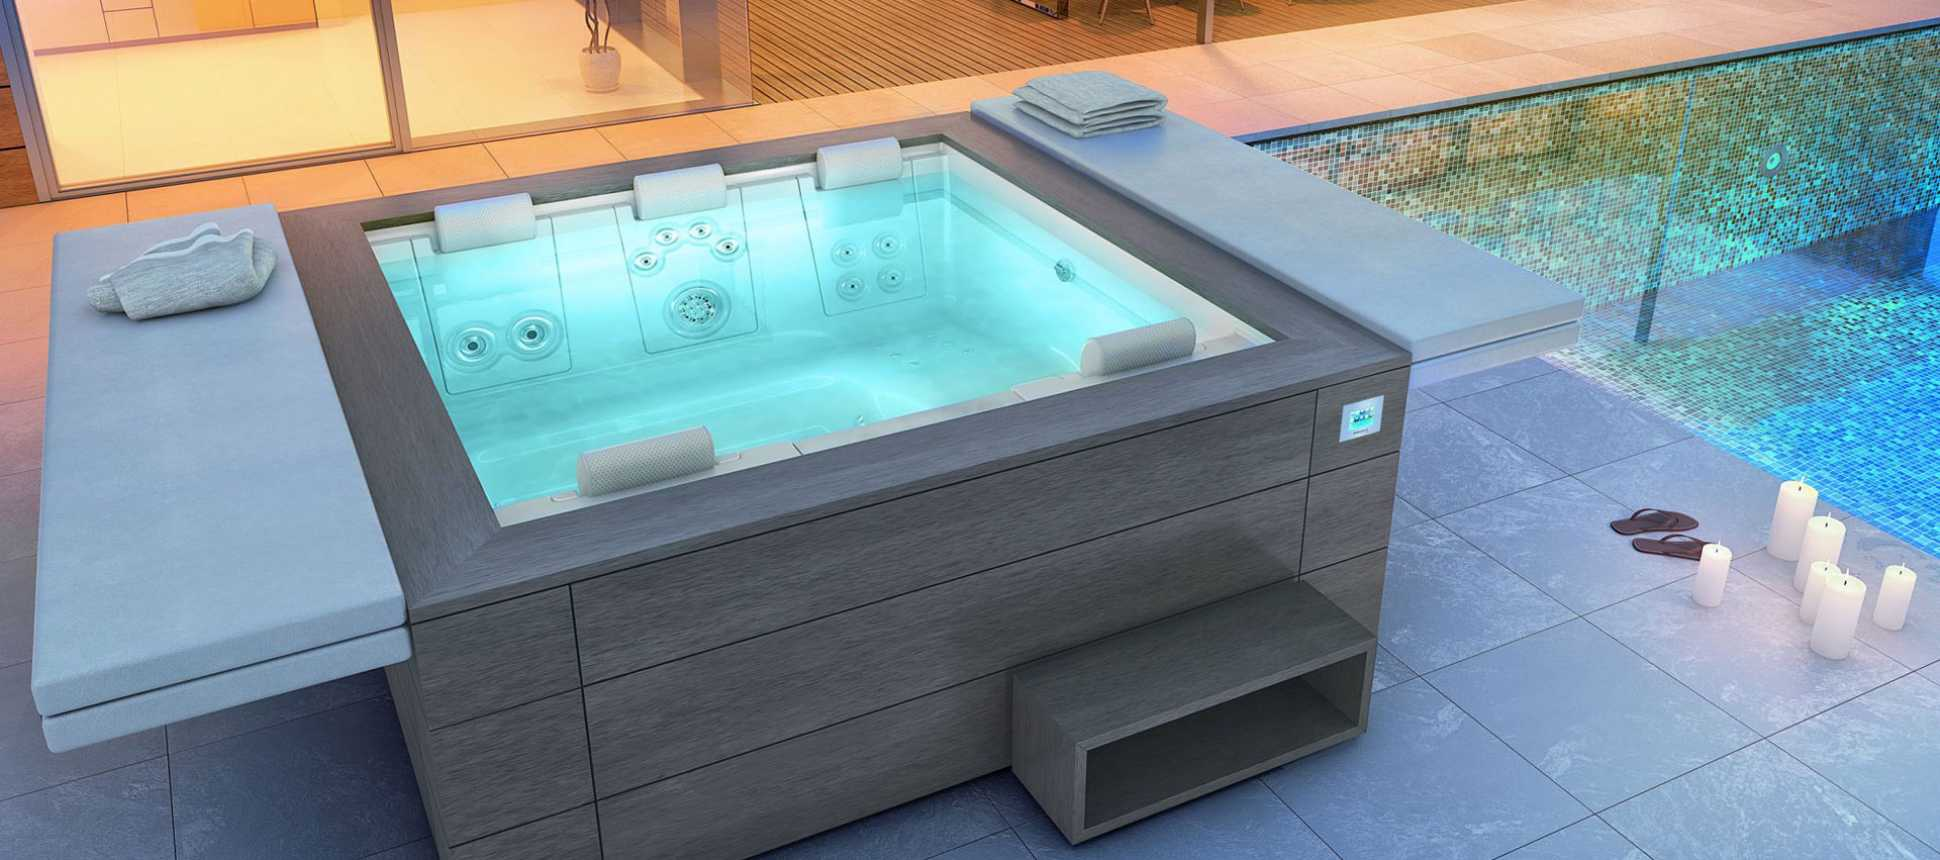 Portable whirlpool ac schwimmbadtechnik - Einbau whirlpool outdoor ...